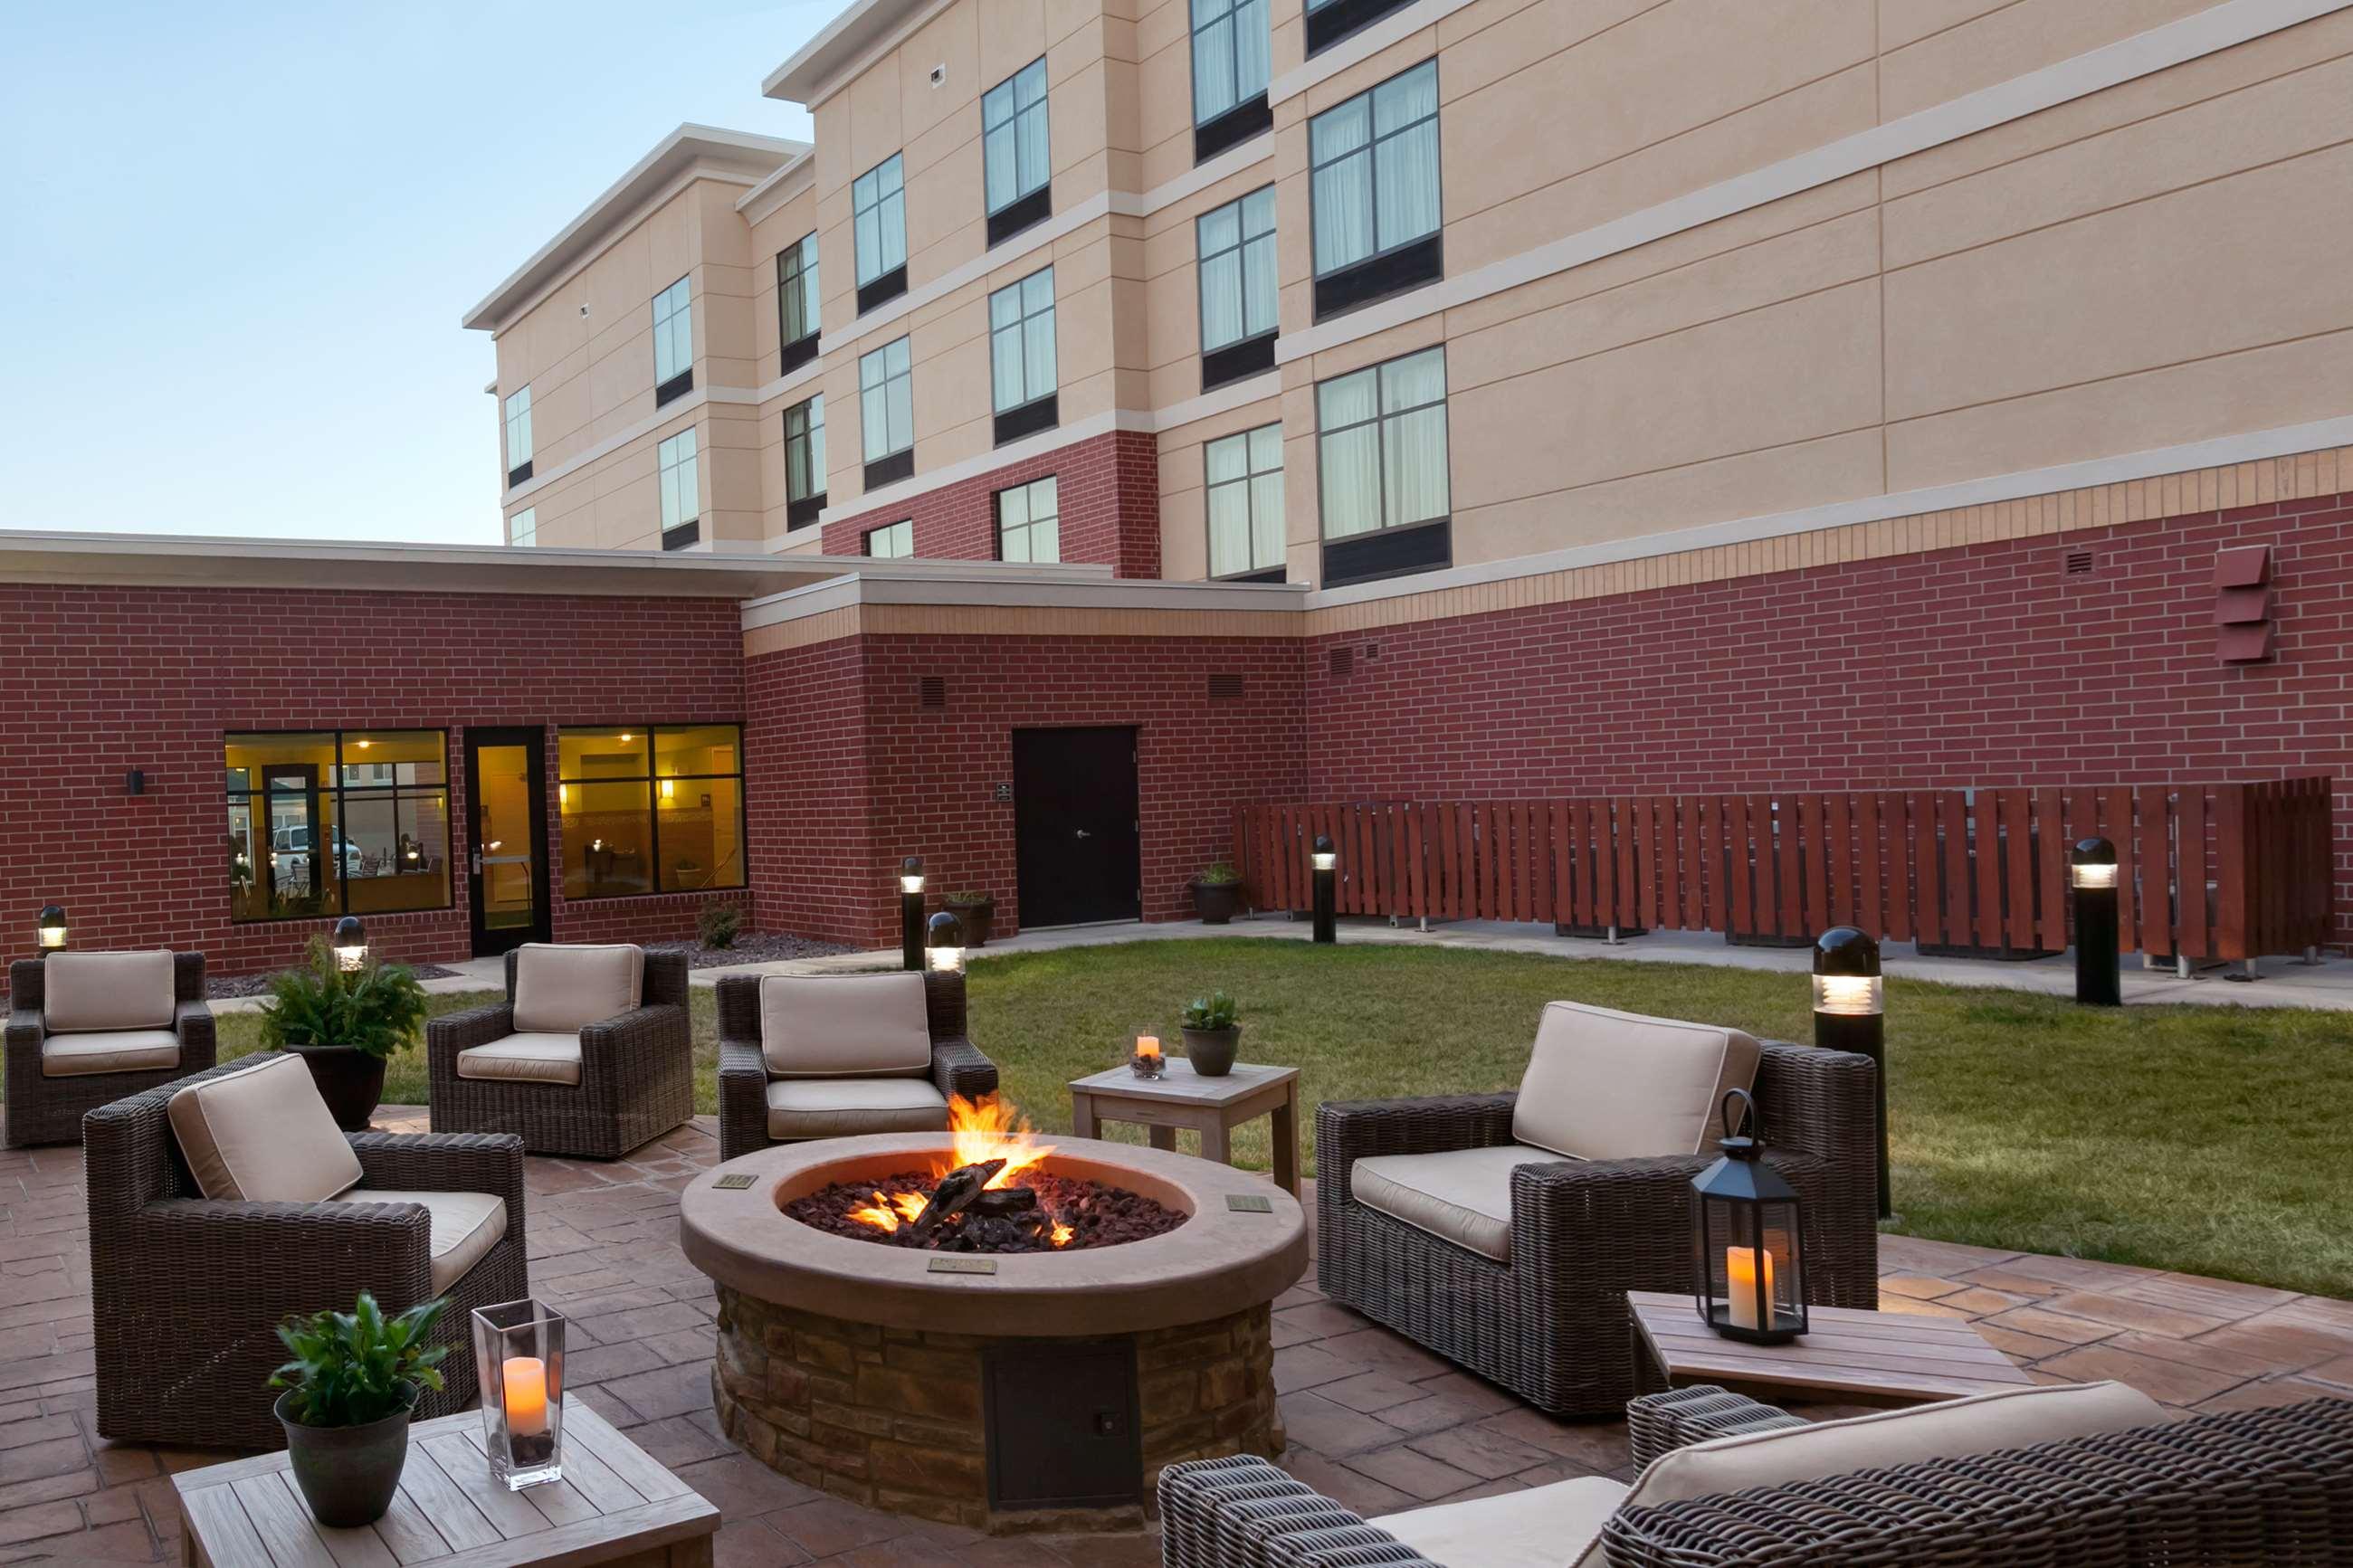 Homewood Suites by Hilton Joplin, MO image 12